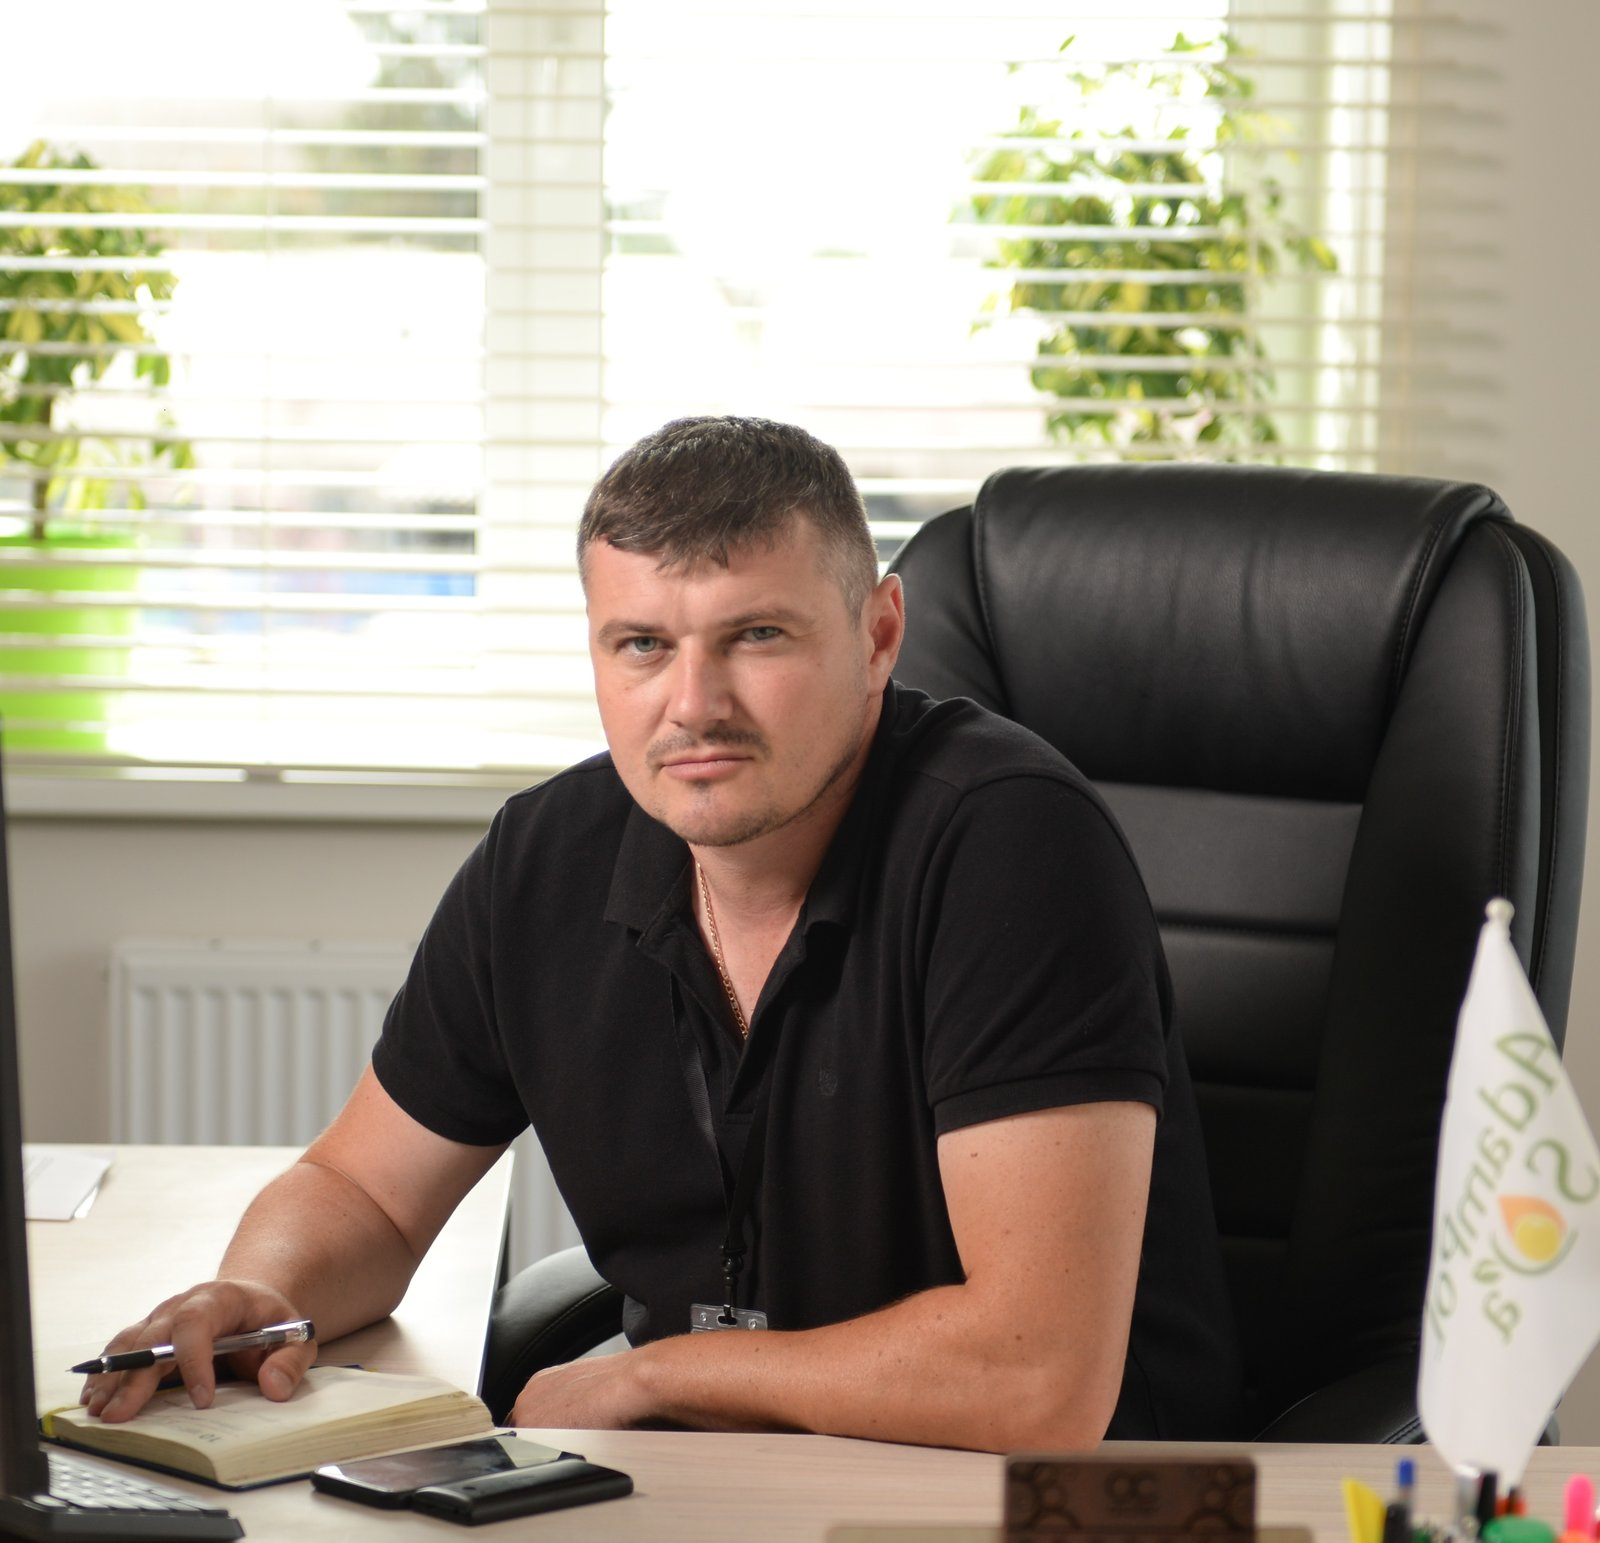 Maksym Teterchuk